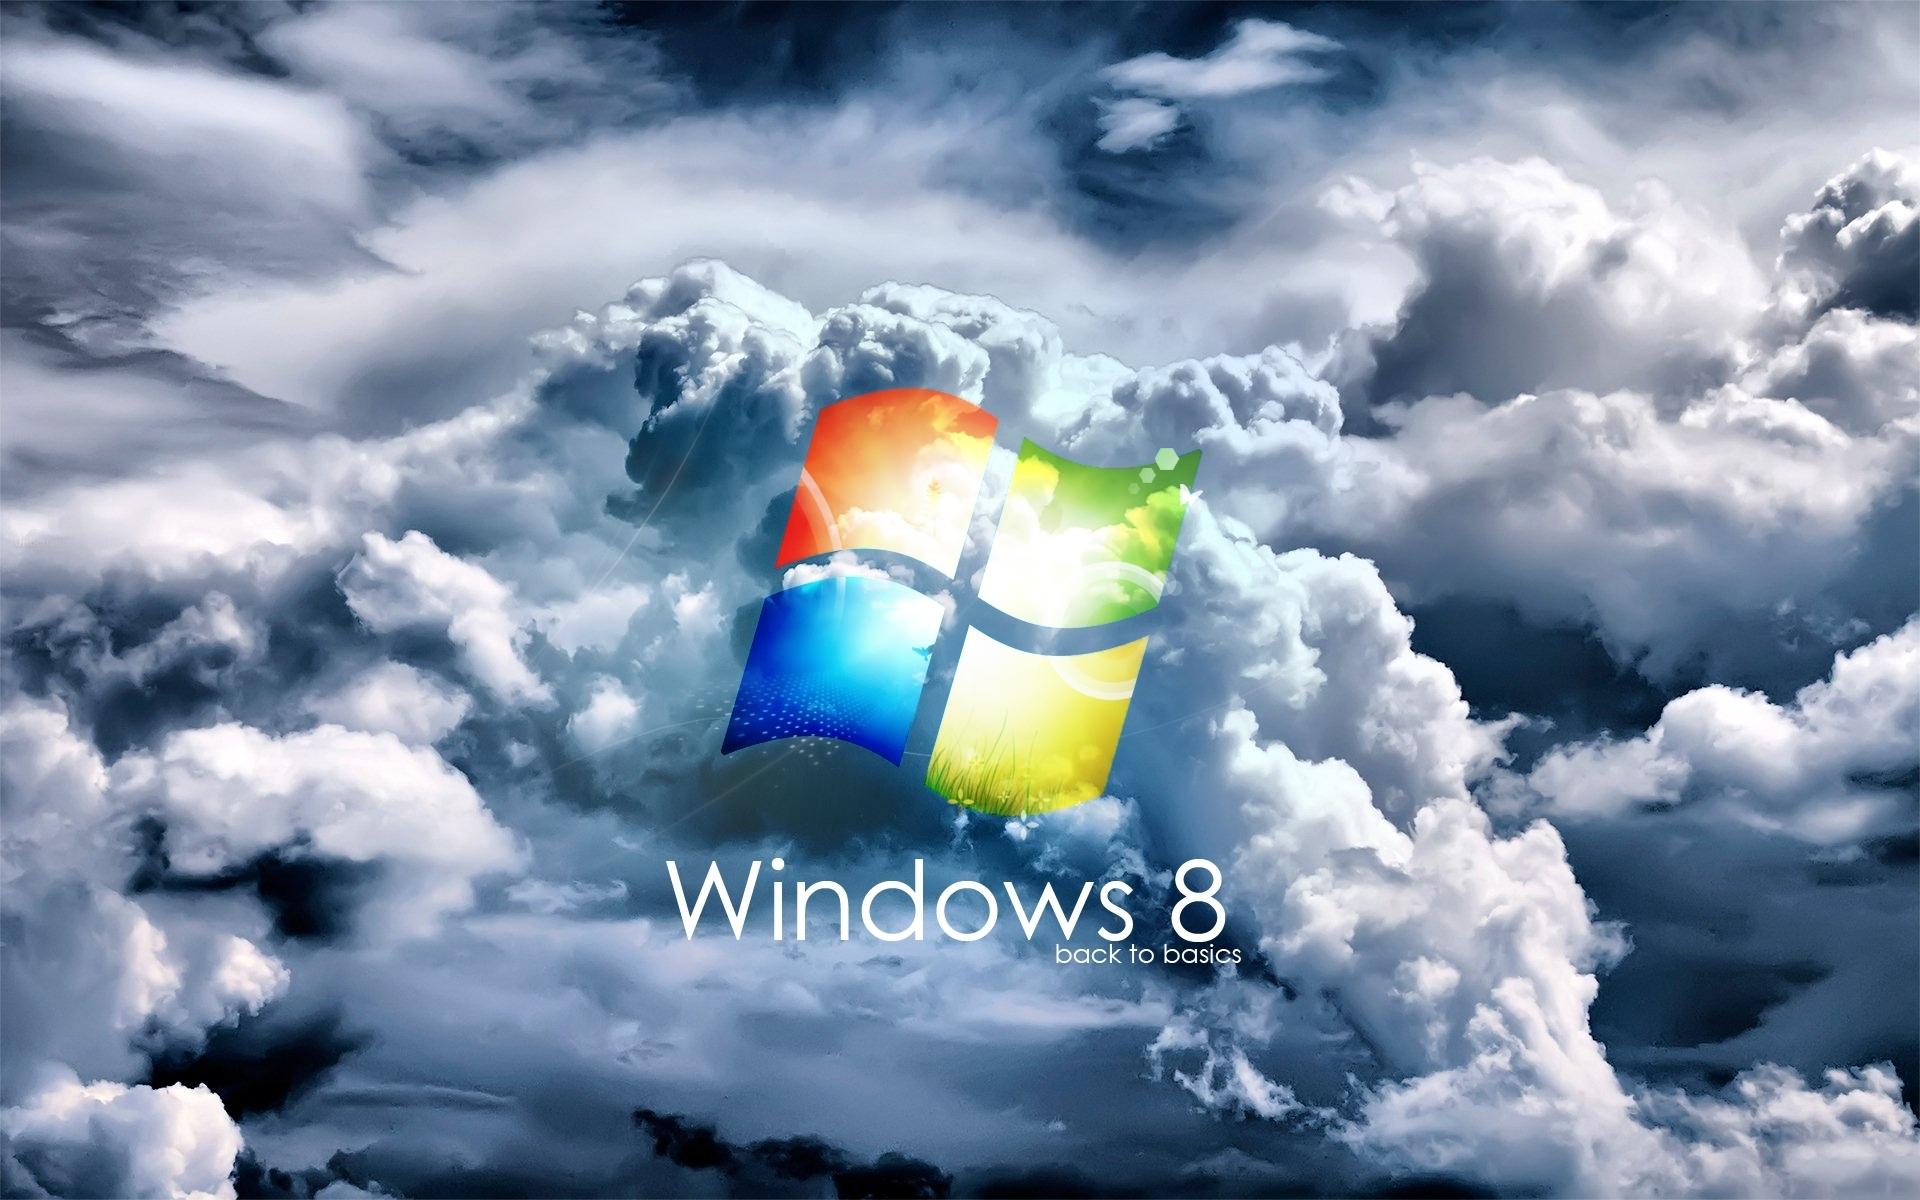 windows-8-wallpapers-hd-3d-for-desktop-gallery-(81-plus)-pic